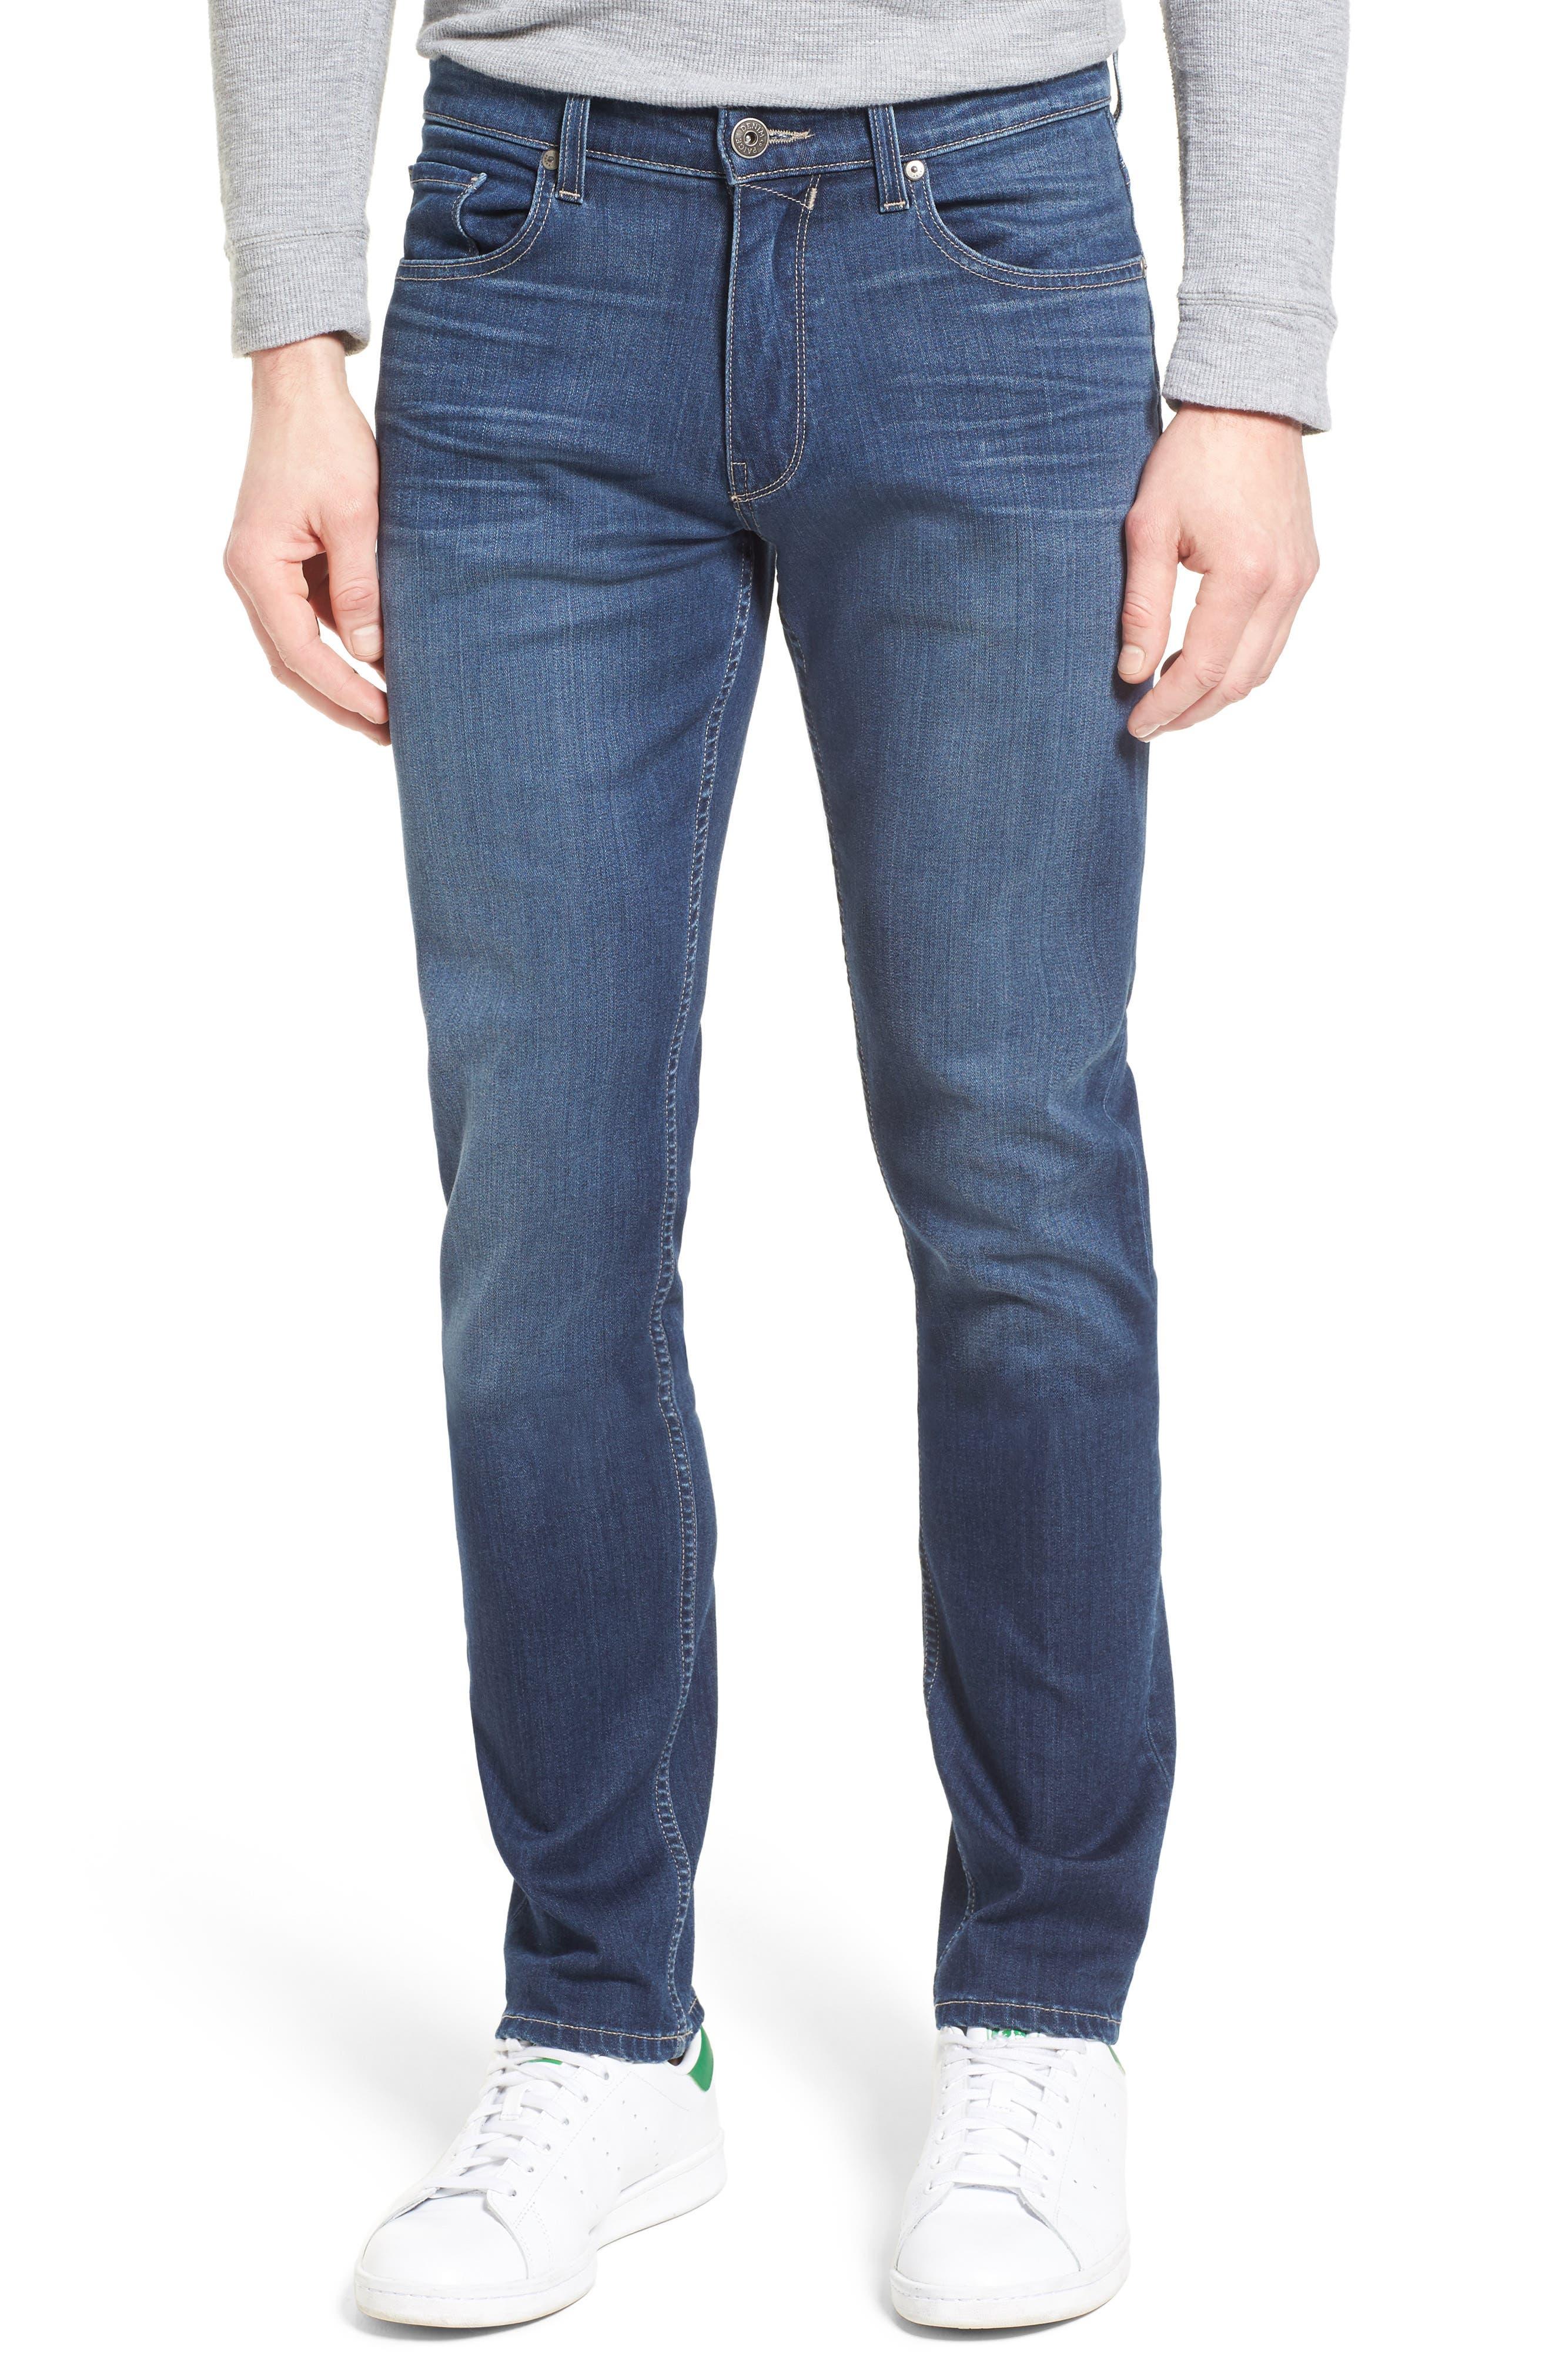 Transcend - Lennox Straight Leg Jeans,                         Main,                         color, 400